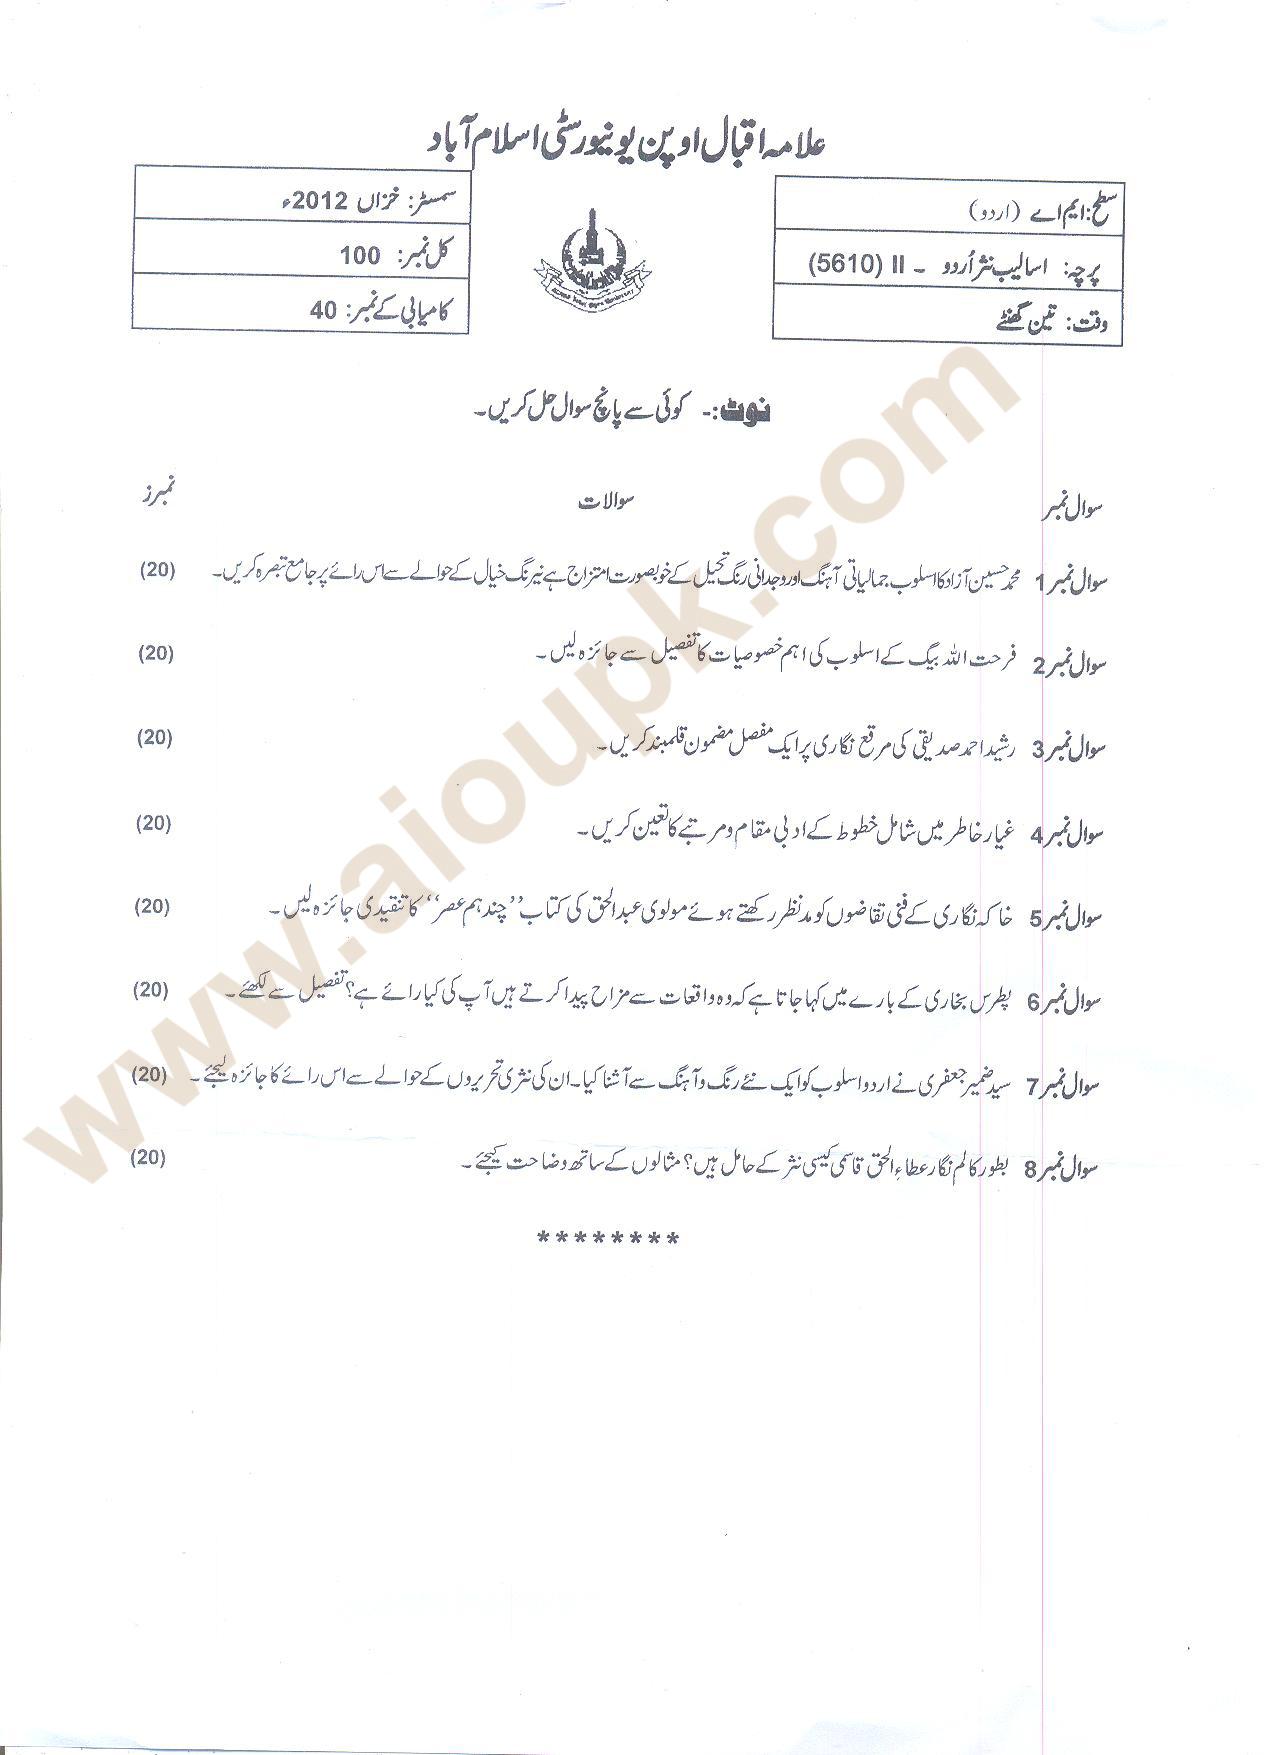 AIOU Question Papers Code 5610 Course: Urdu Prose-II